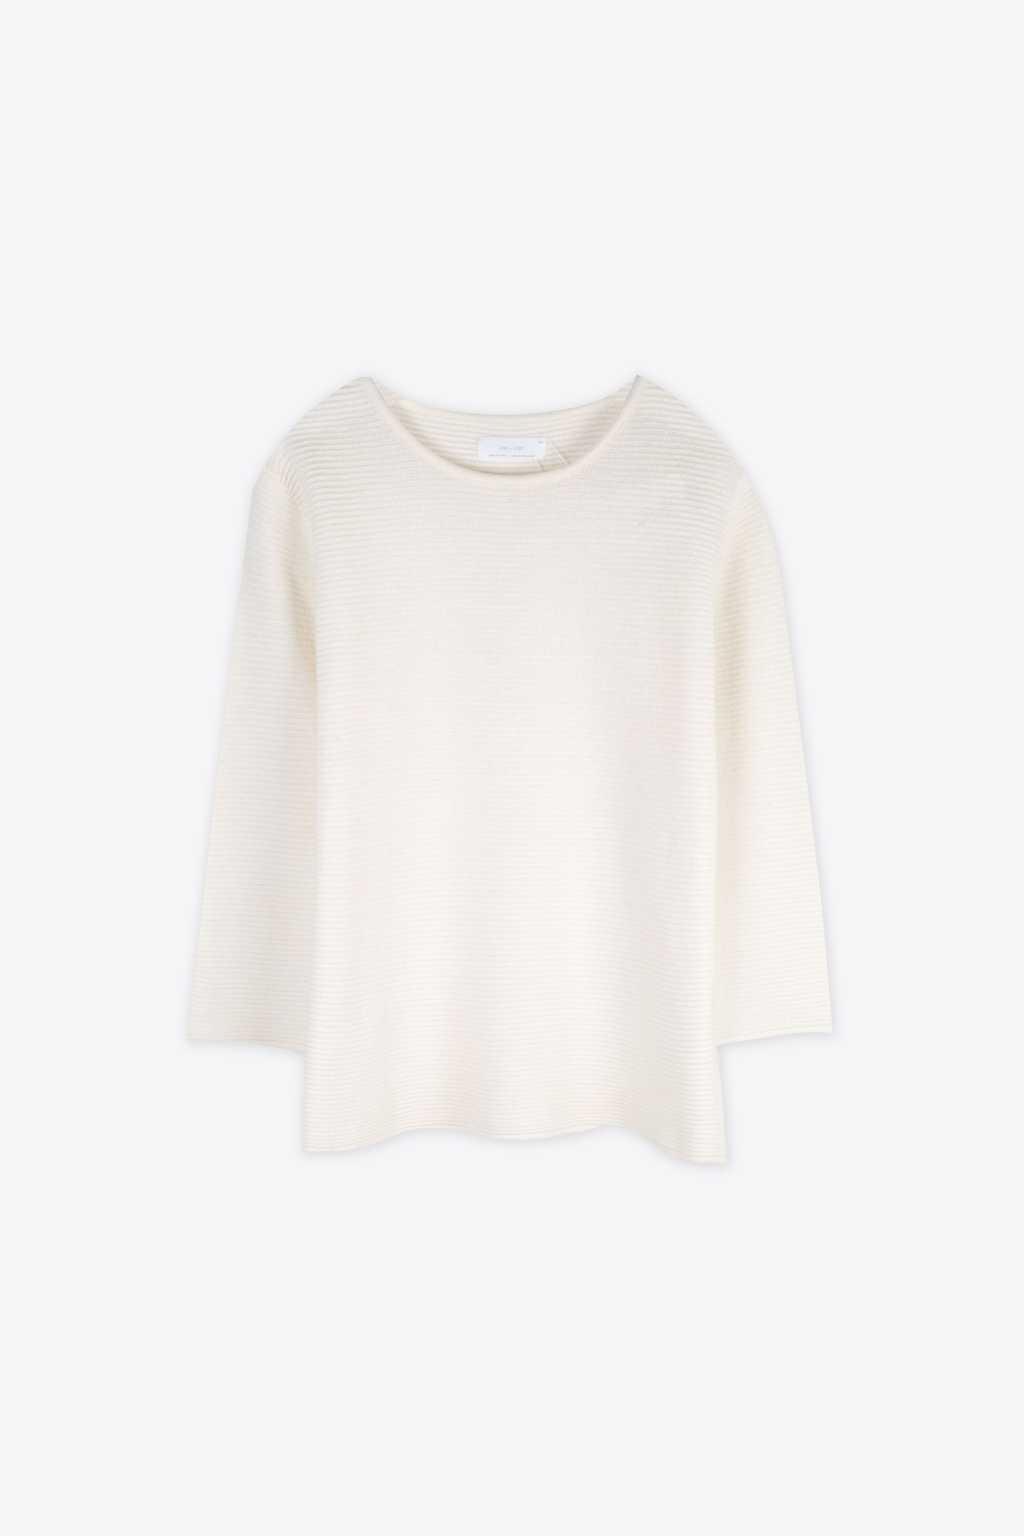 Sweater 1793 Cream 6